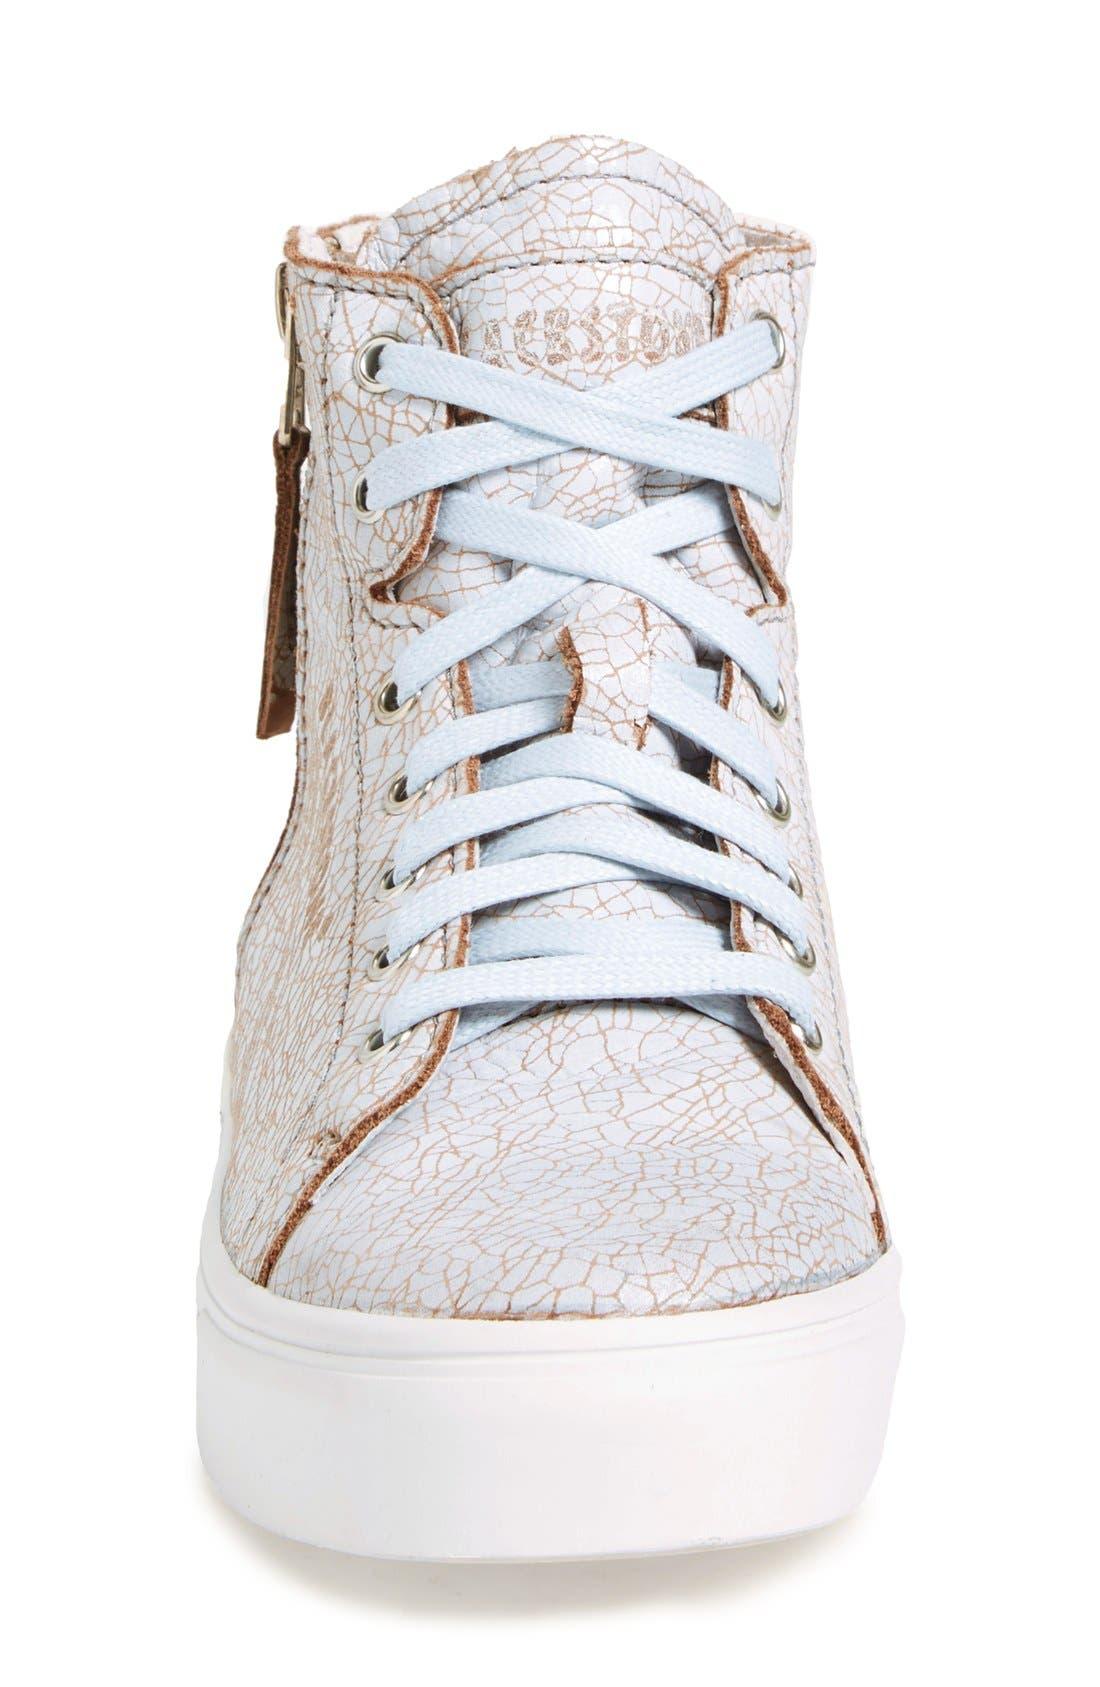 'LL78' Crackled High Top Platform Sneaker,                             Alternate thumbnail 3, color,                             Hazel/White